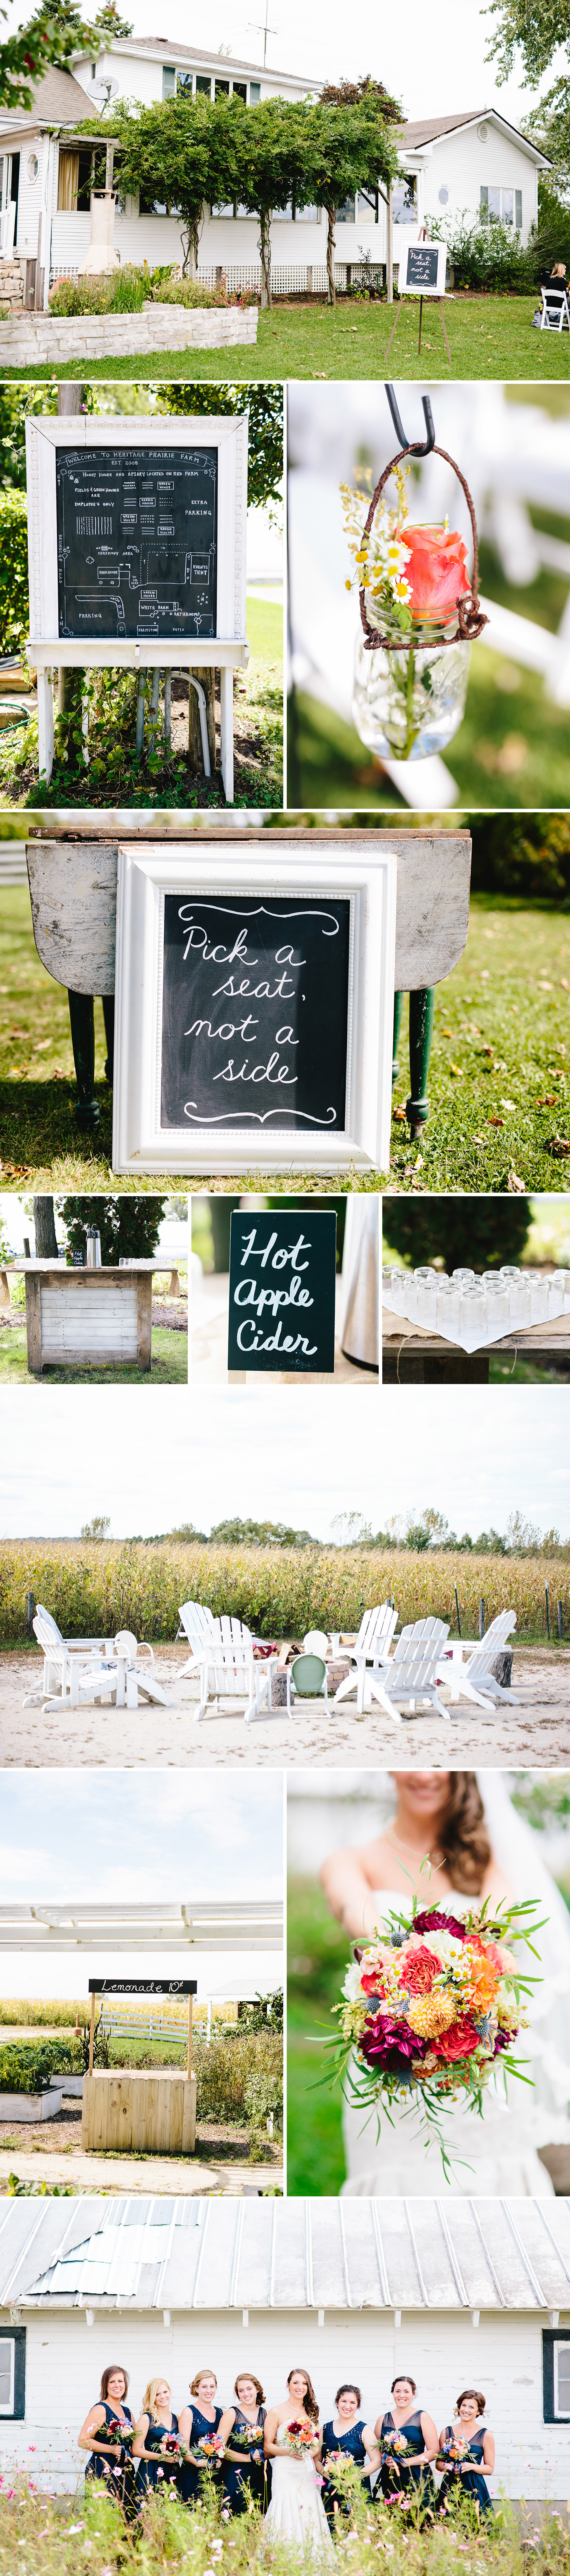 chicago-fine-art-wedding-photography-aloisio2